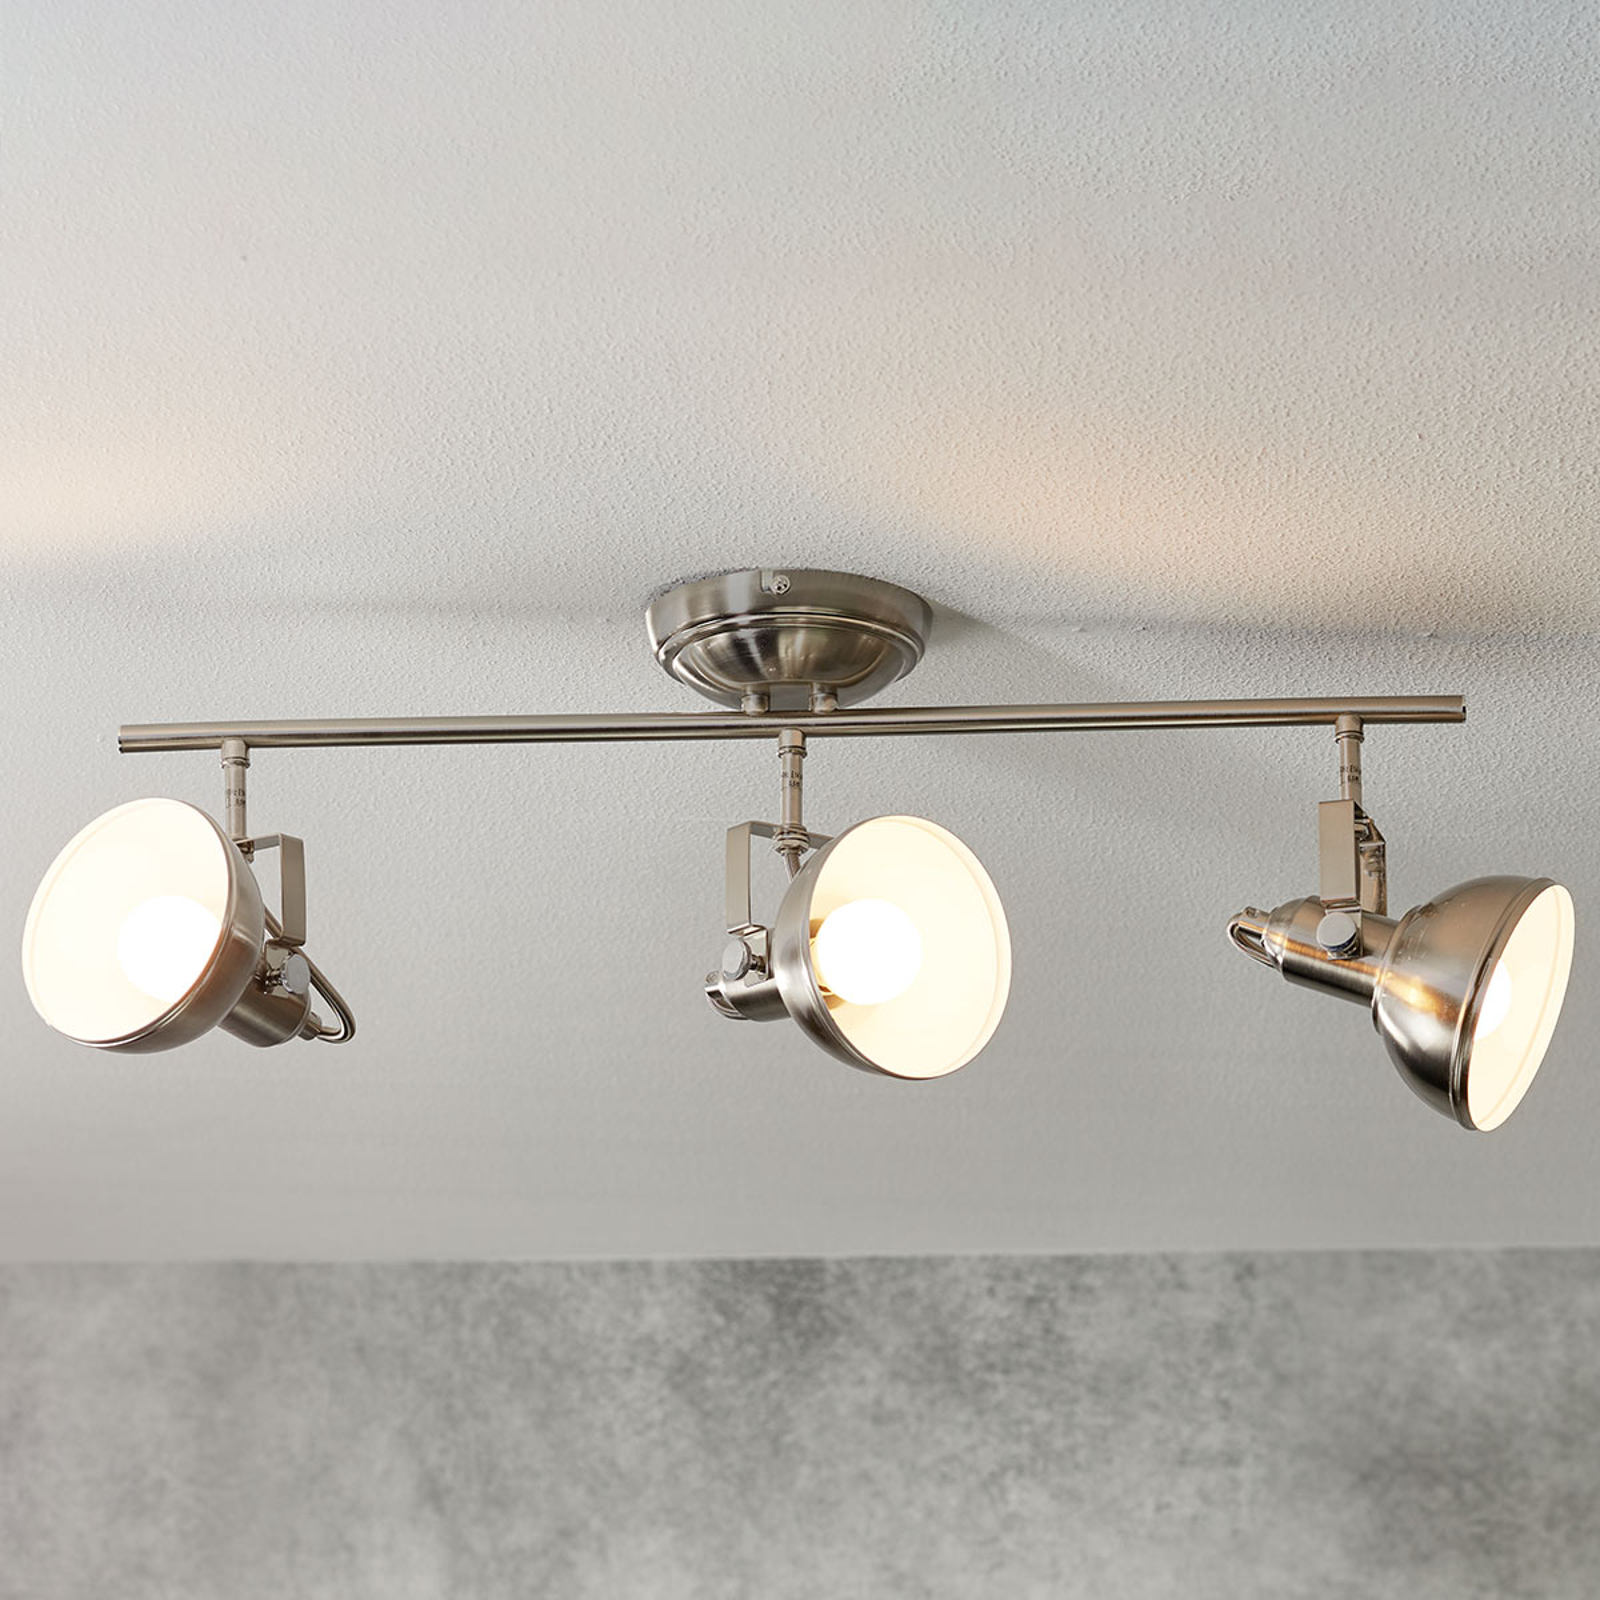 Plafondlamp Gina in industriële look 3 lichtbr.